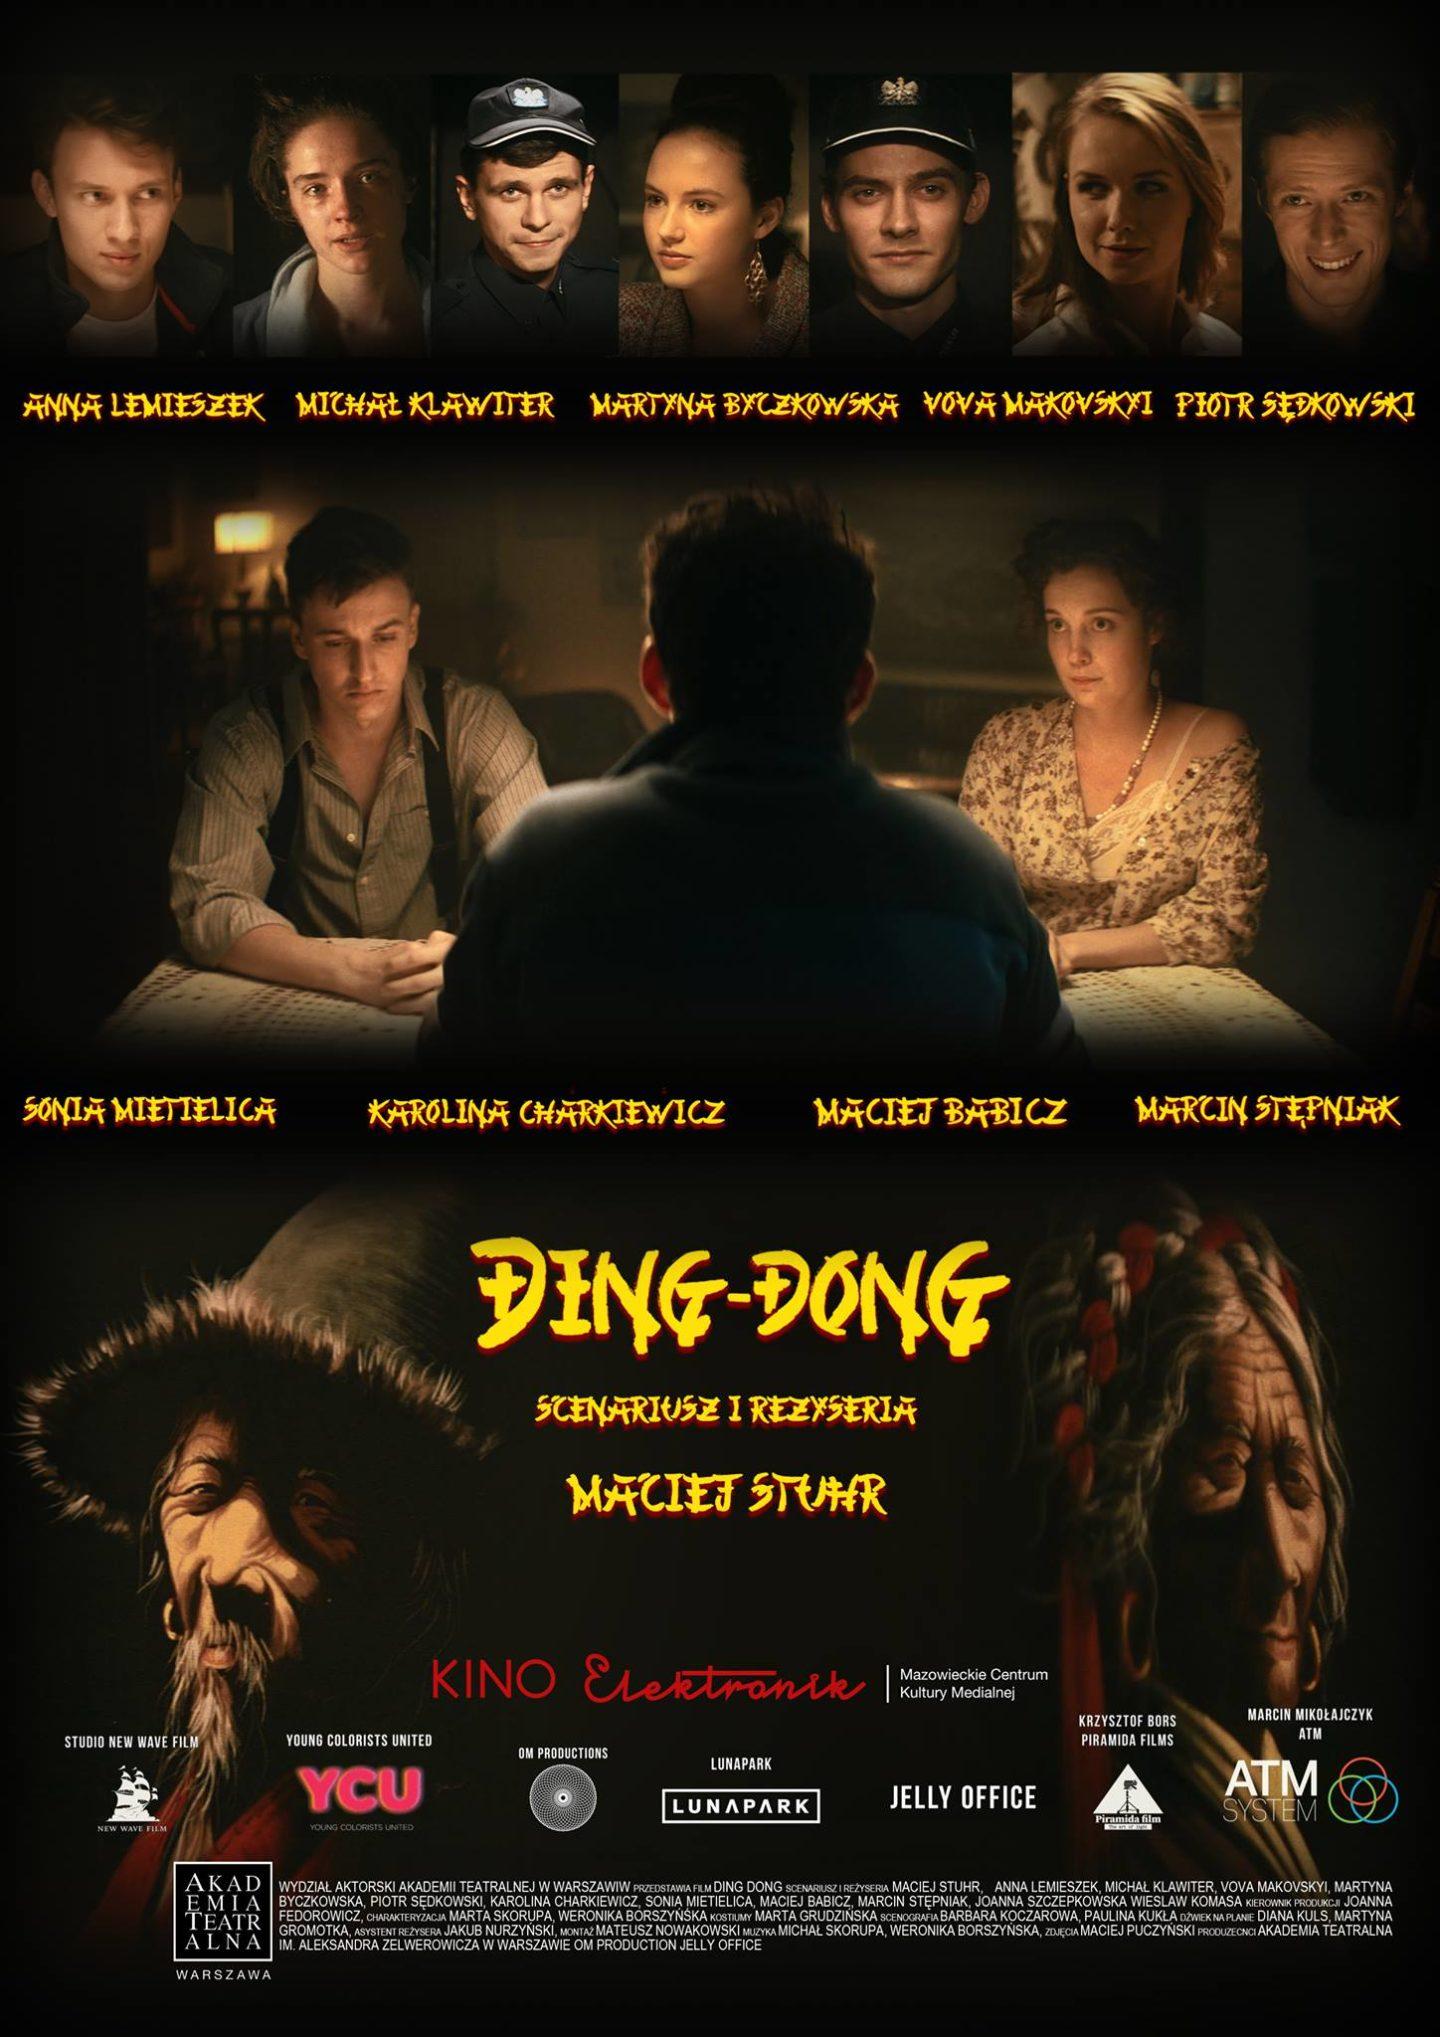 "Premiera filmu studentów IV roku ""Ding Dong"" wreżyserii Macieja Stuhra"